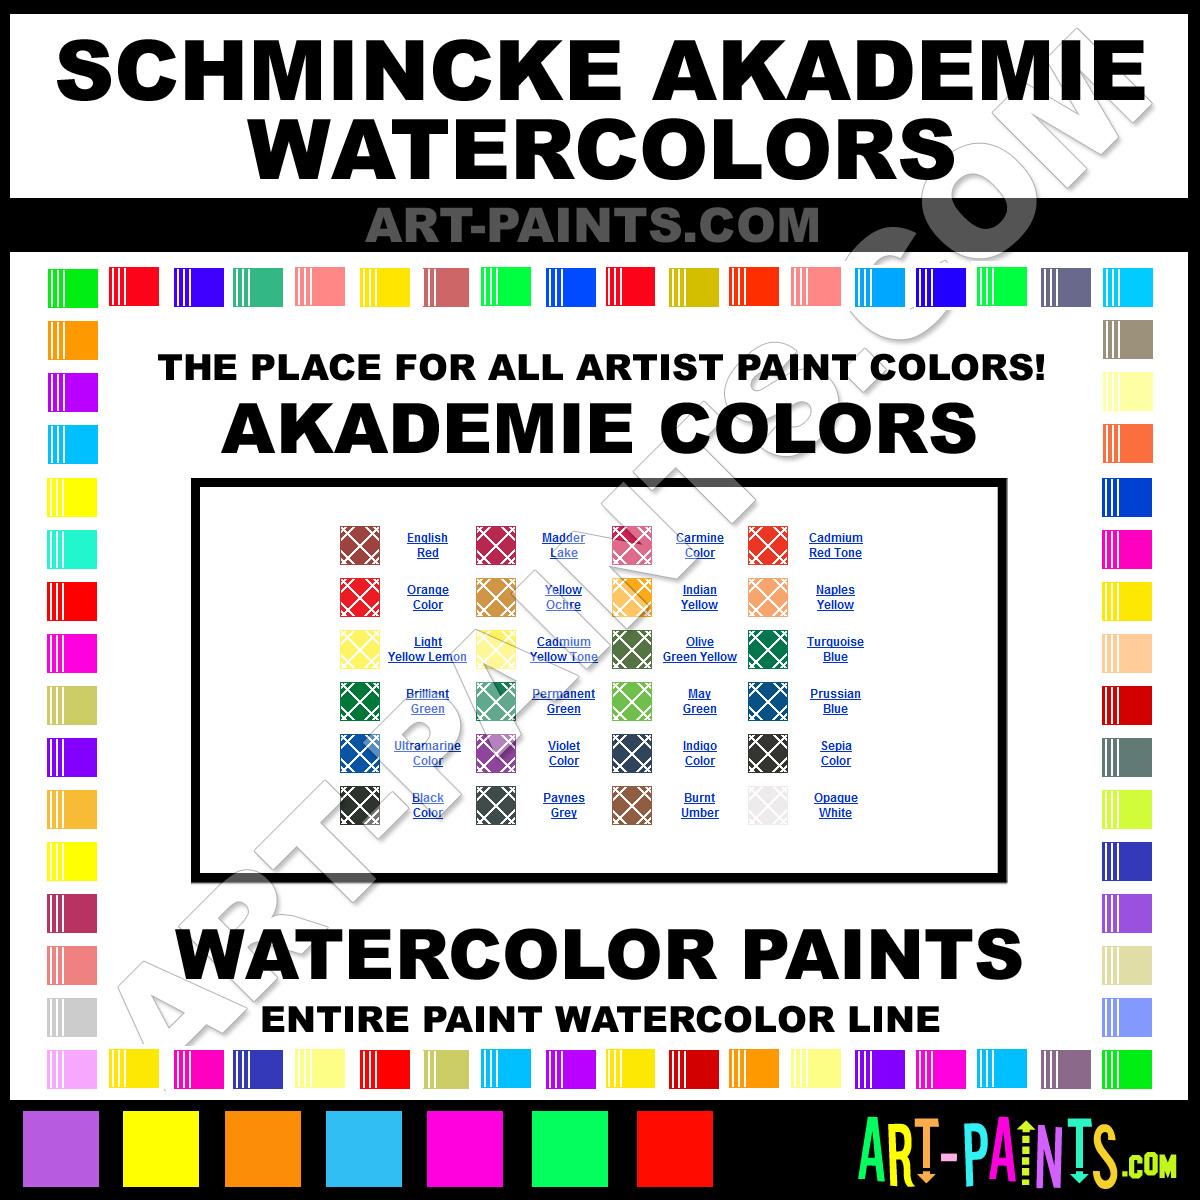 Schmincke Akademie Aquarell Watercolor Paint Colors